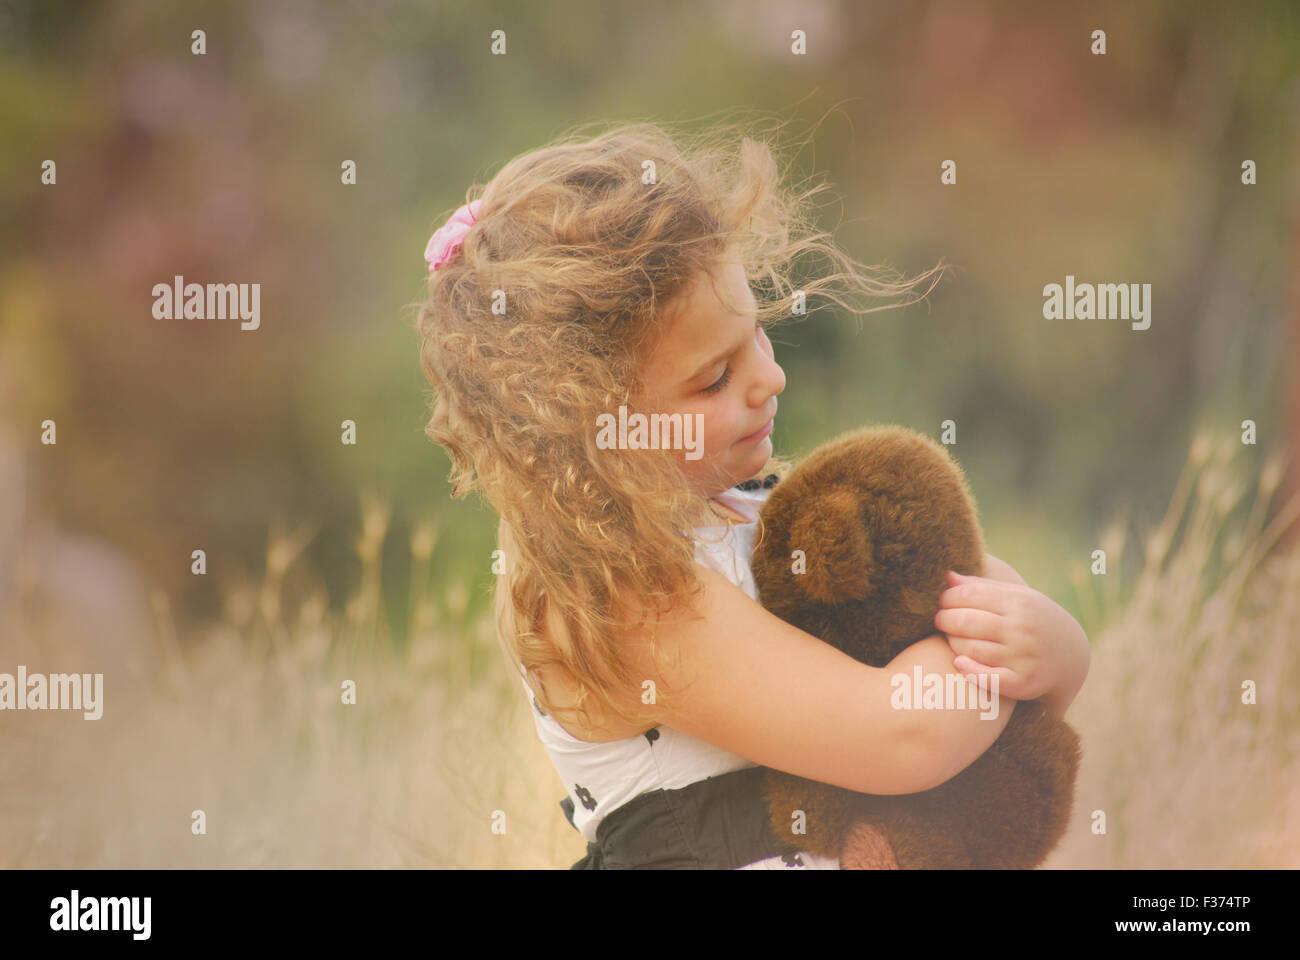 Little girl embracing her teddy bear - Stock Image